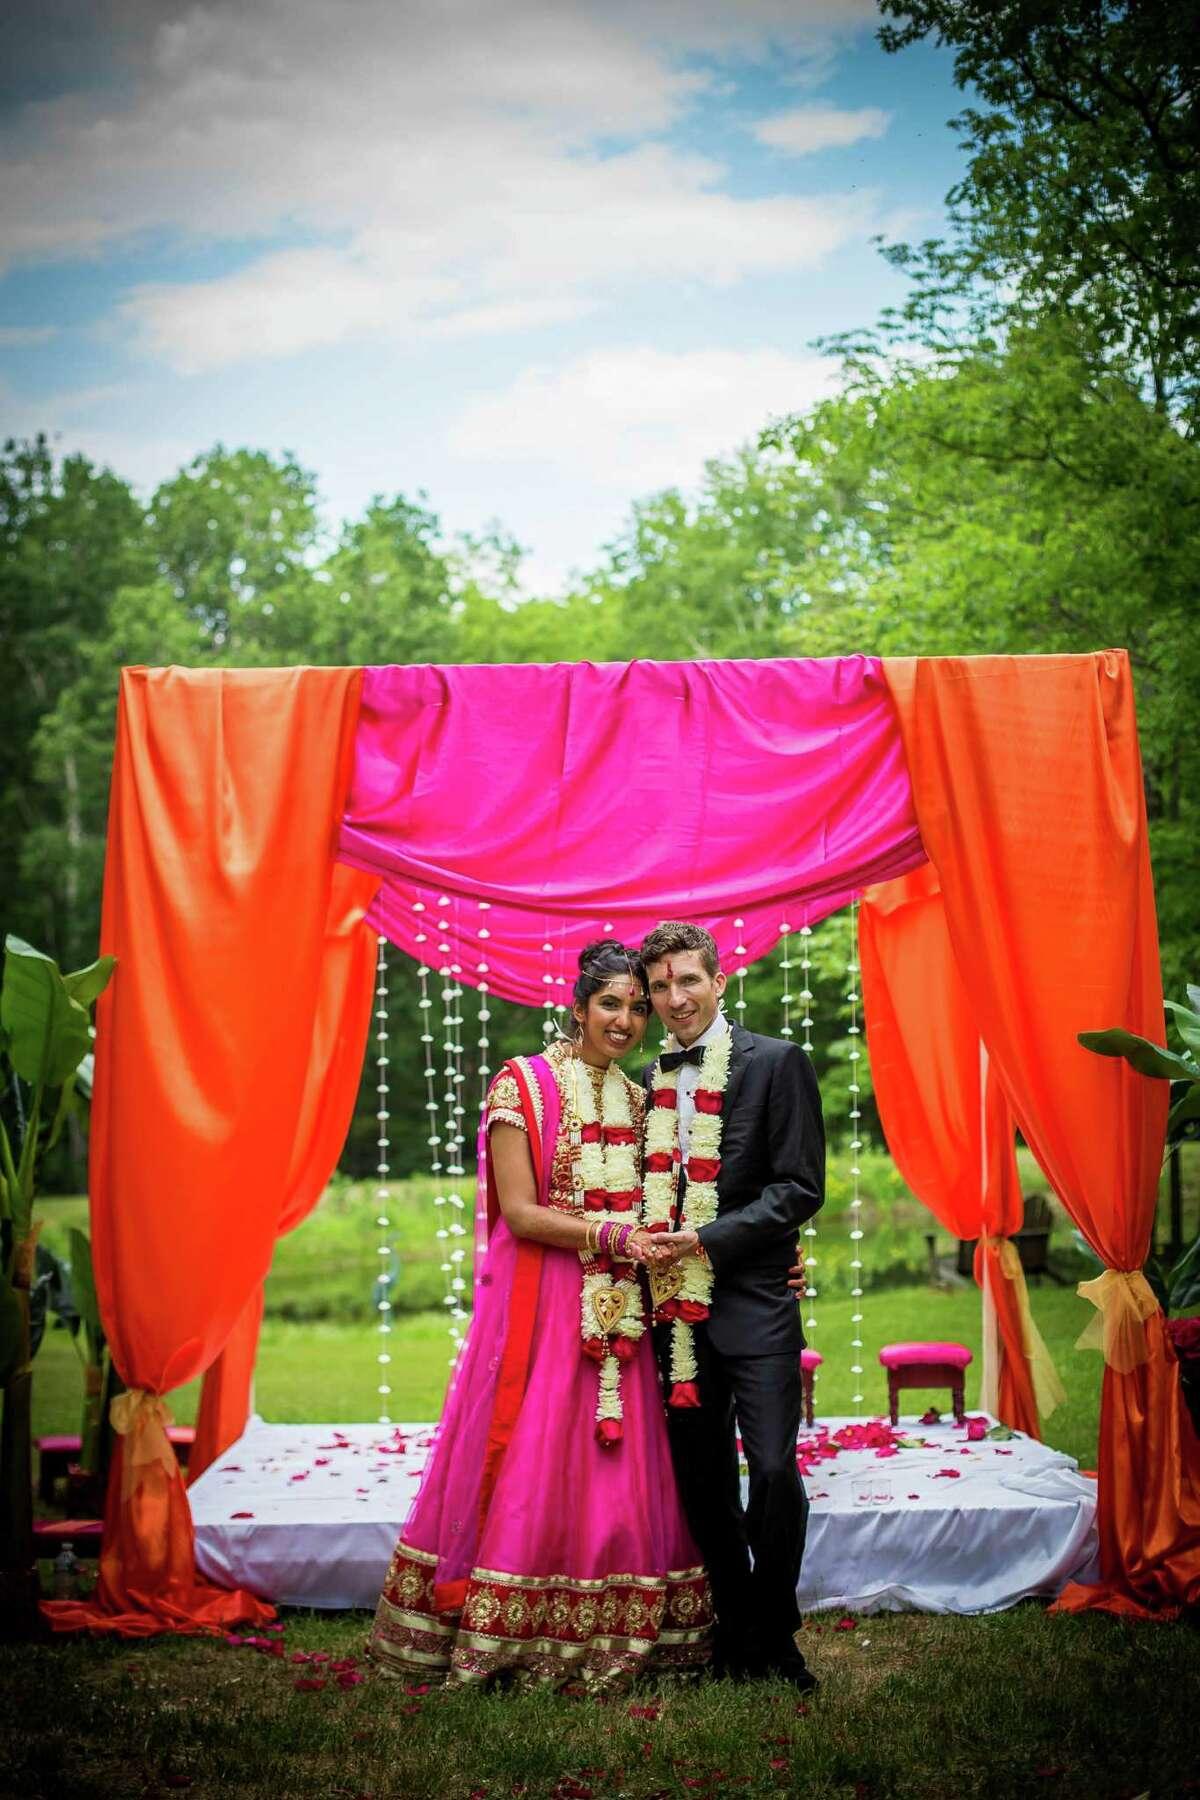 Puja and Daniel Post Senning pose at their May 30, 2015 nuptials. (Dexter Davis Photography)